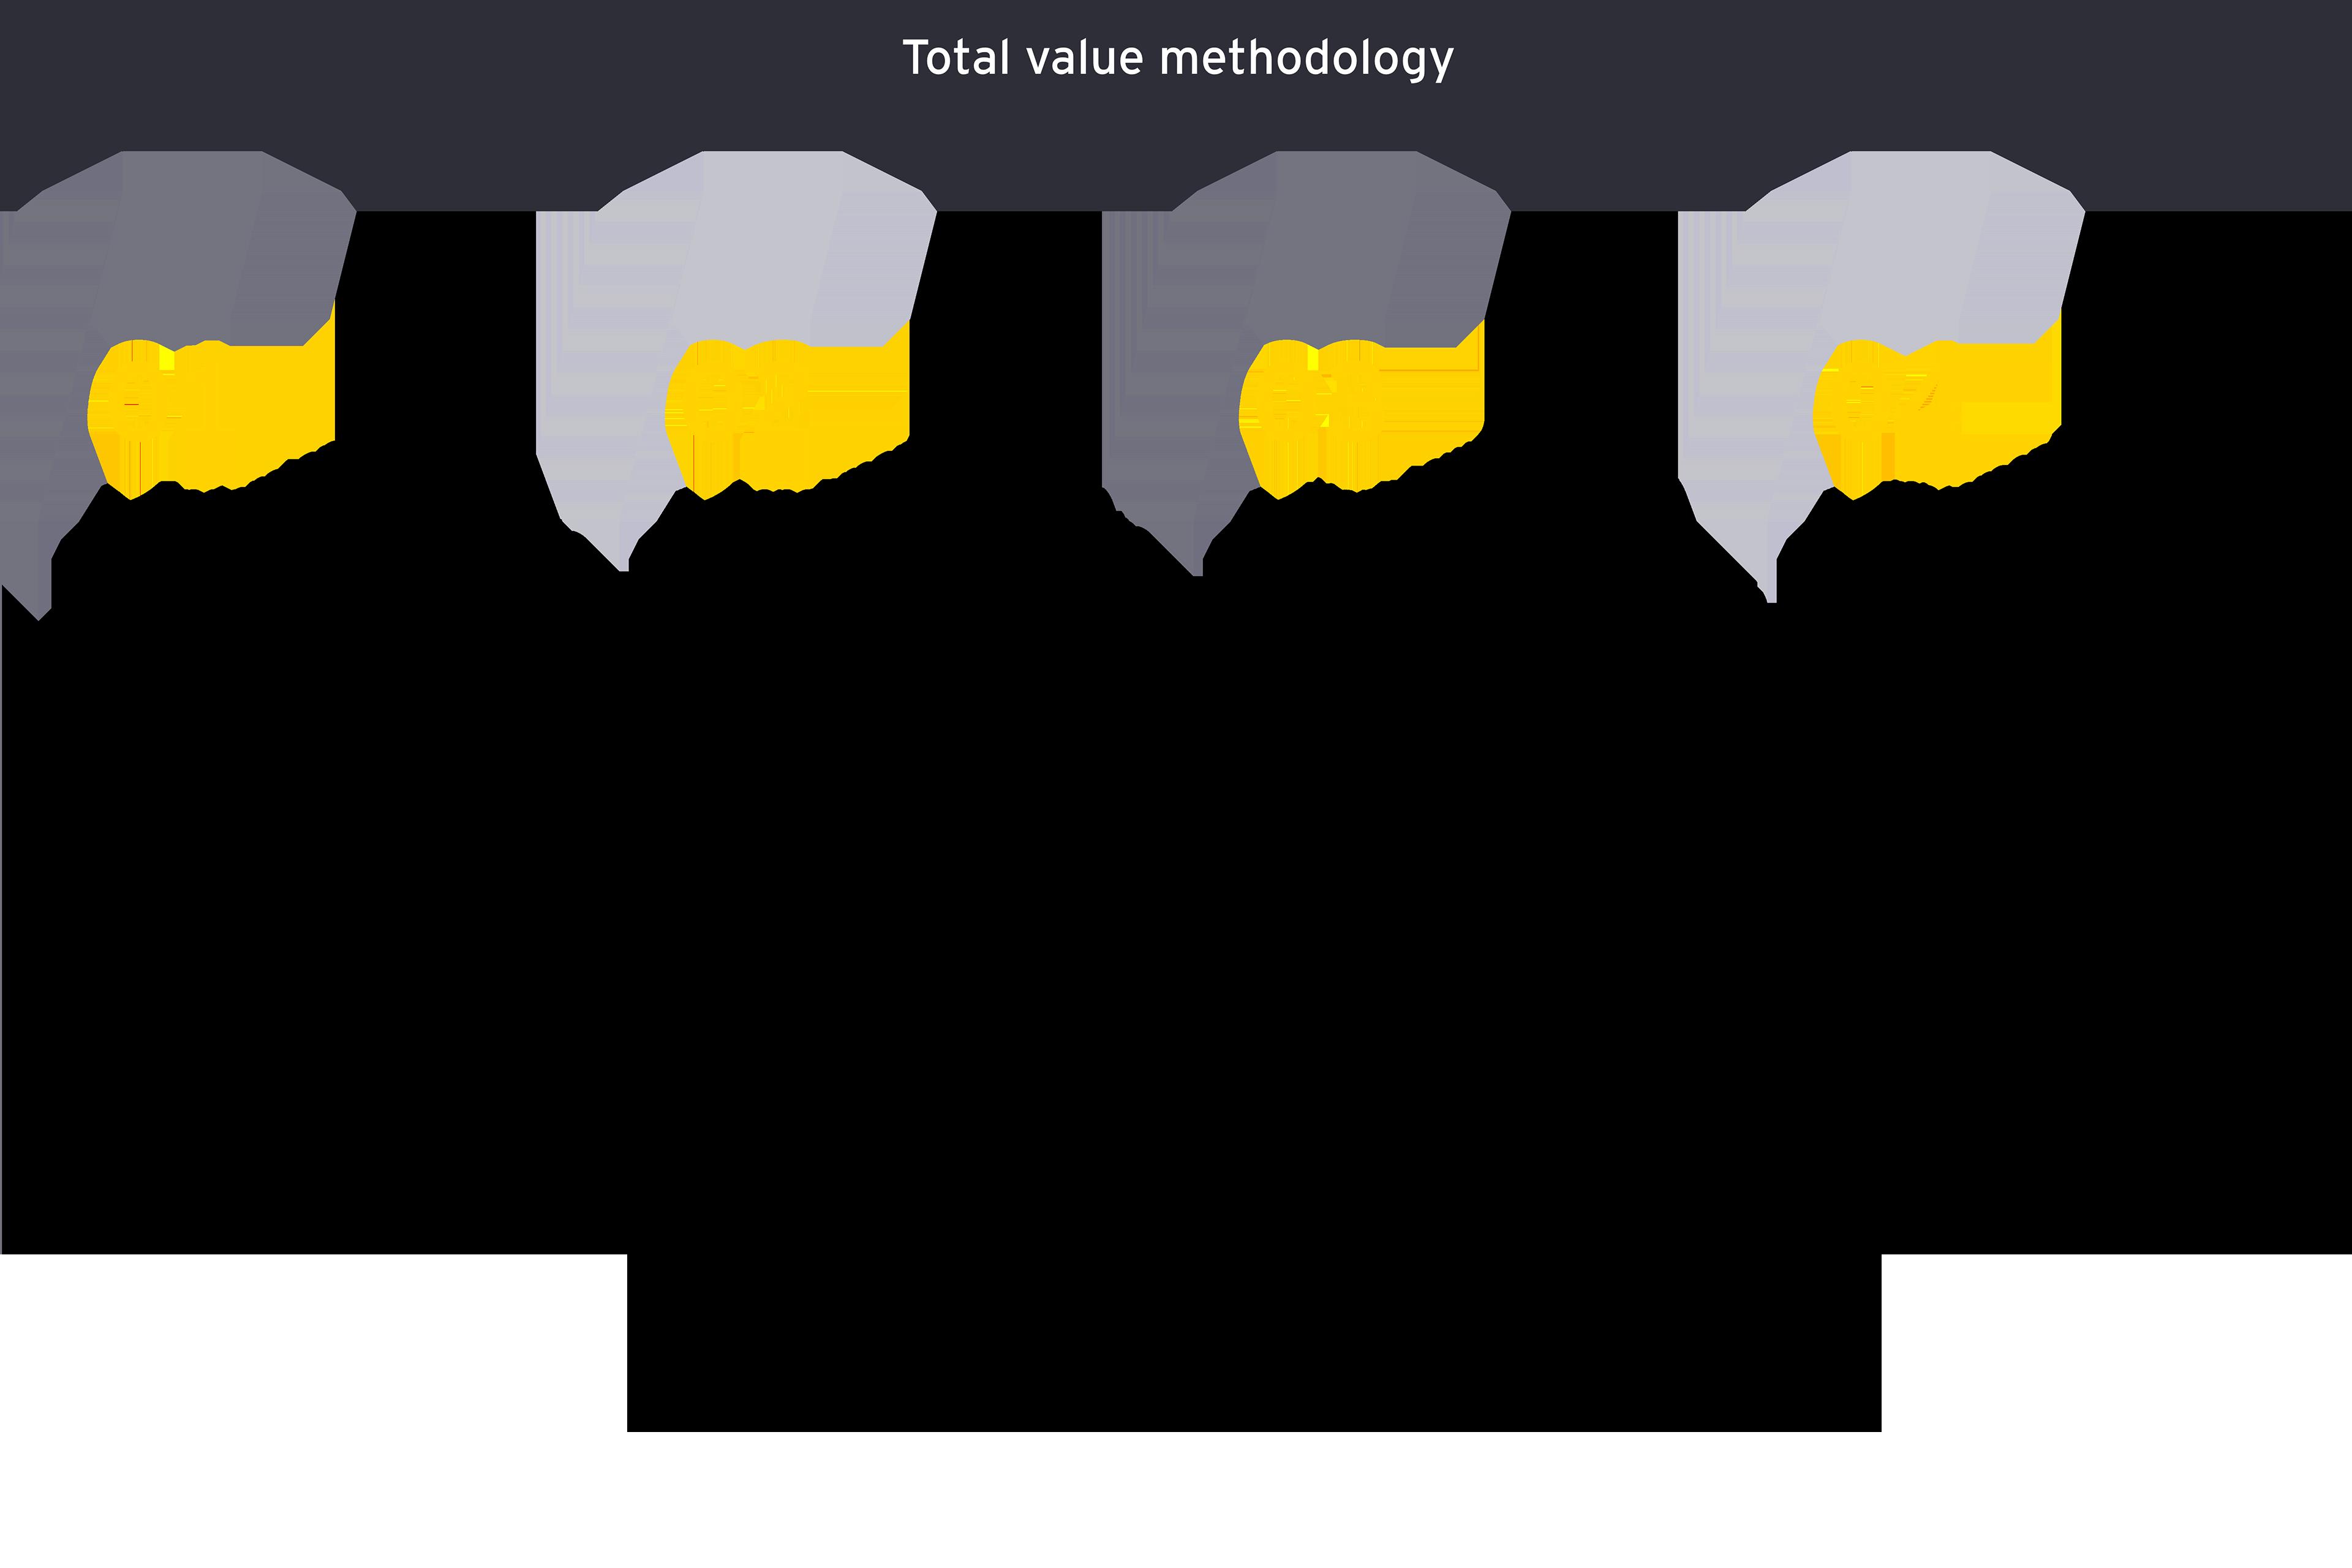 Total value methodology